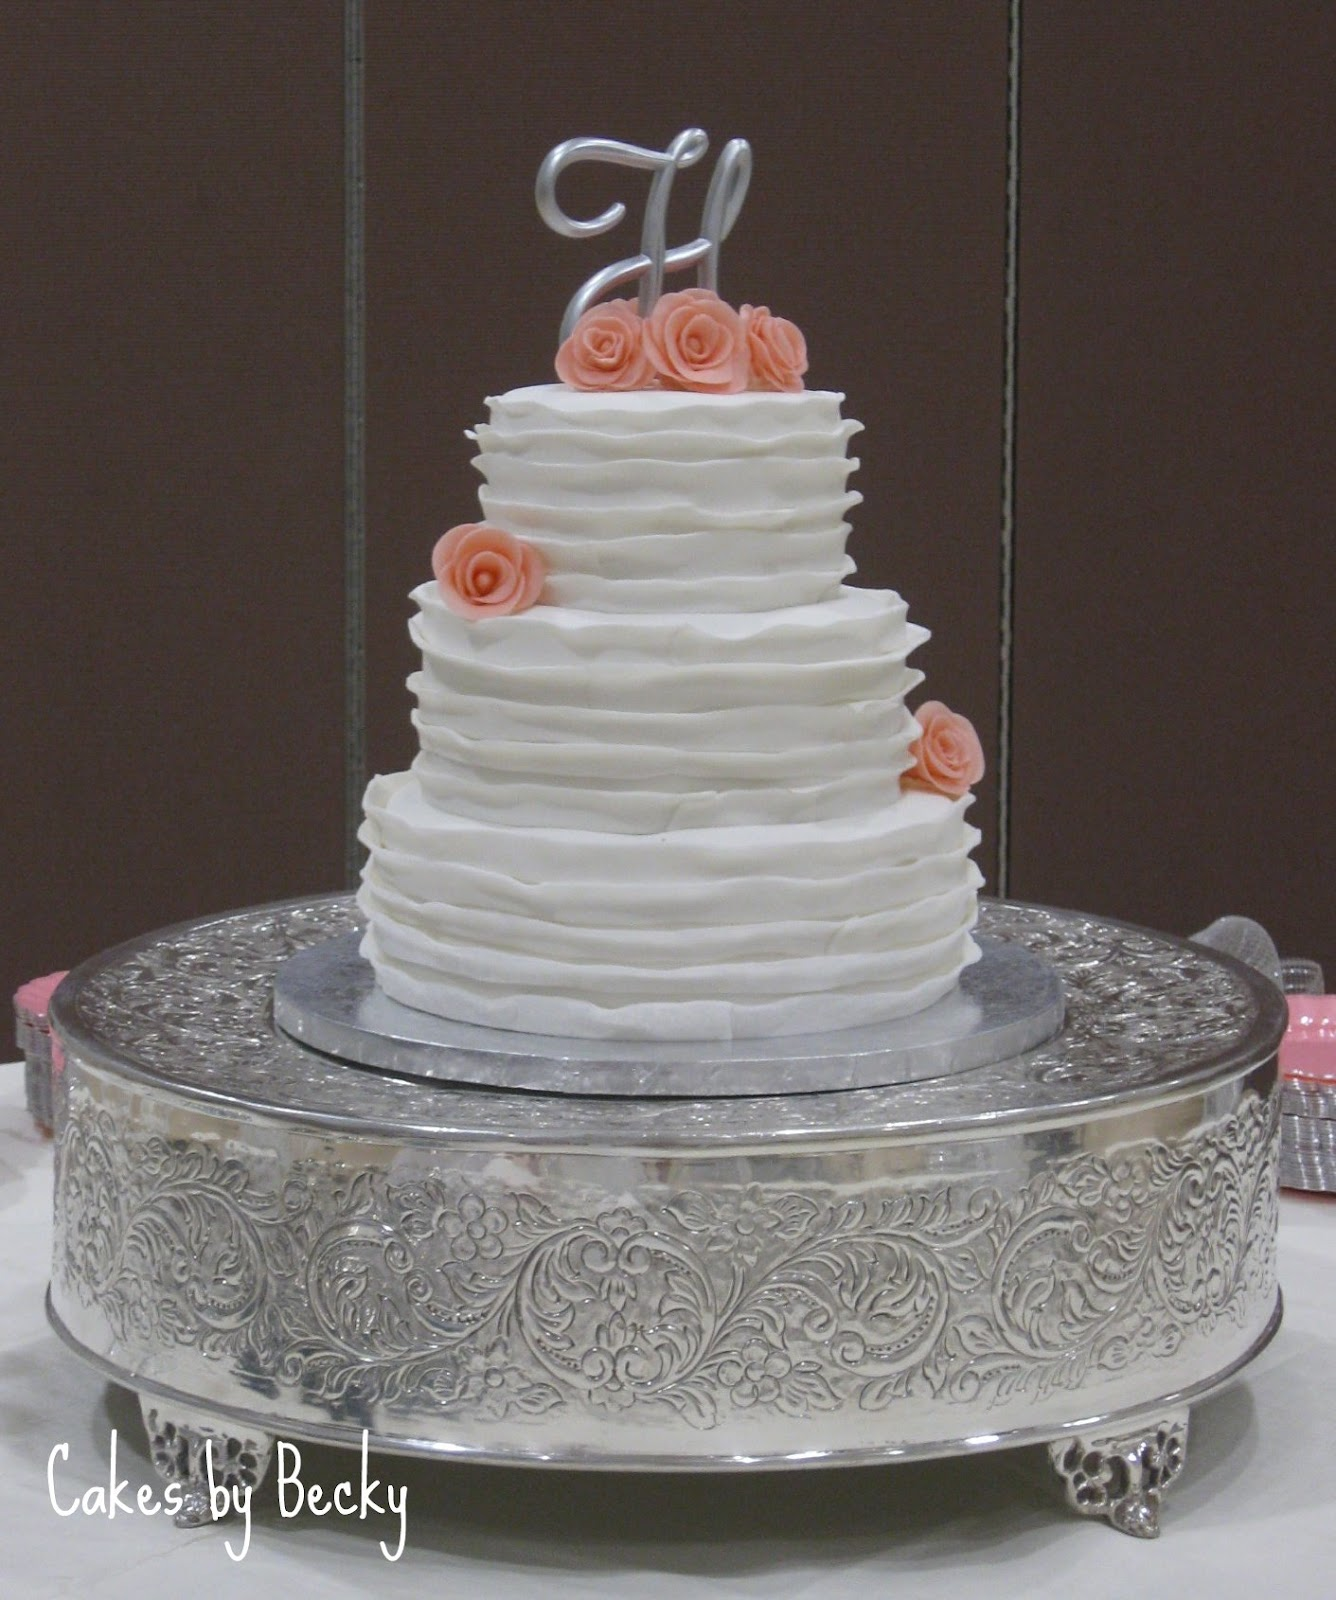 Cakes by Becky White Ruffled Wedding Cake